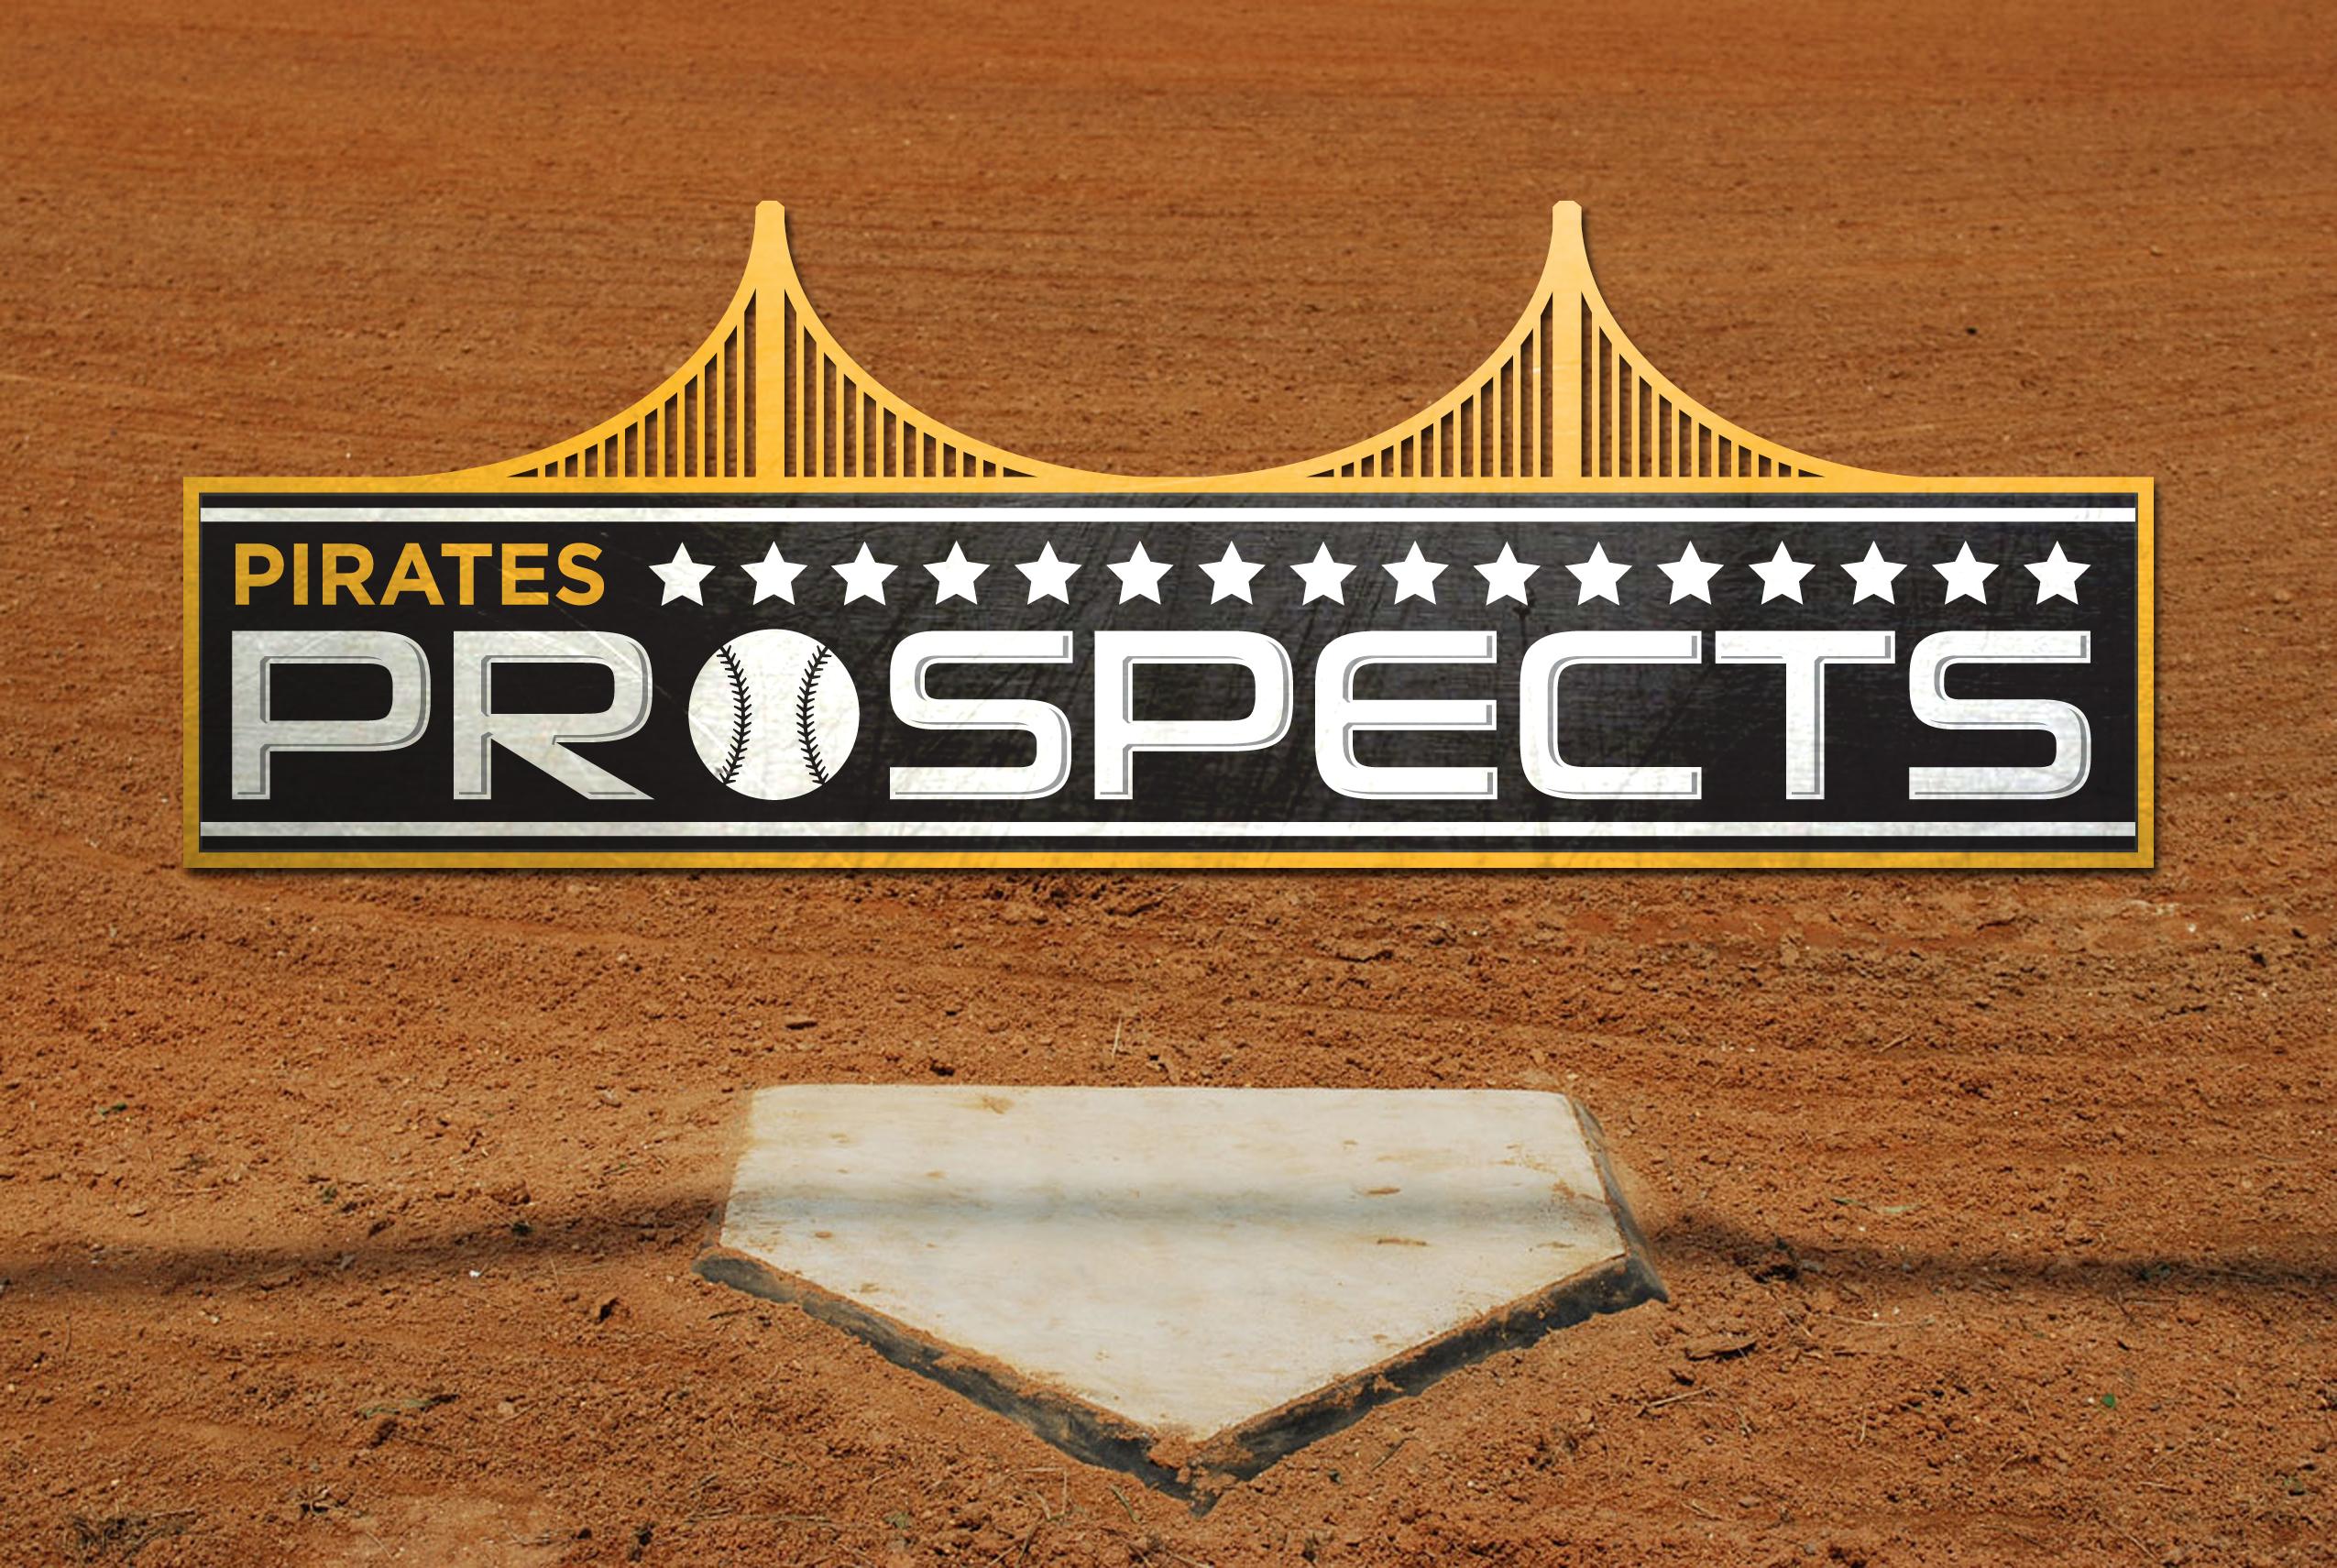 Pirates Prospects logo